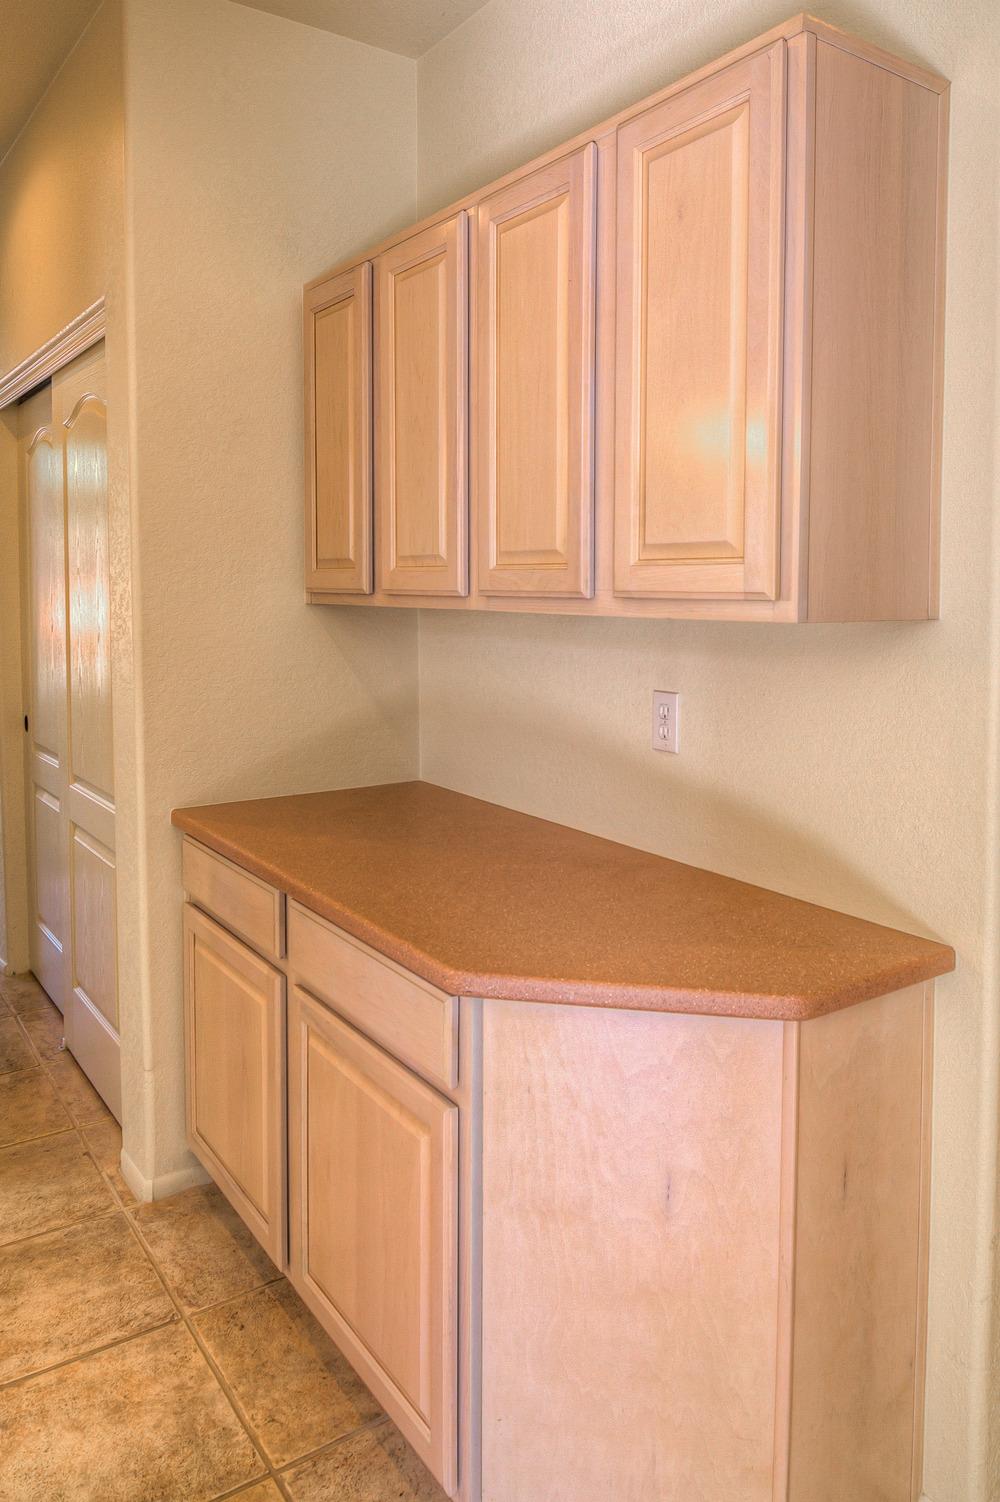 20 Hall Cabinets.jpg